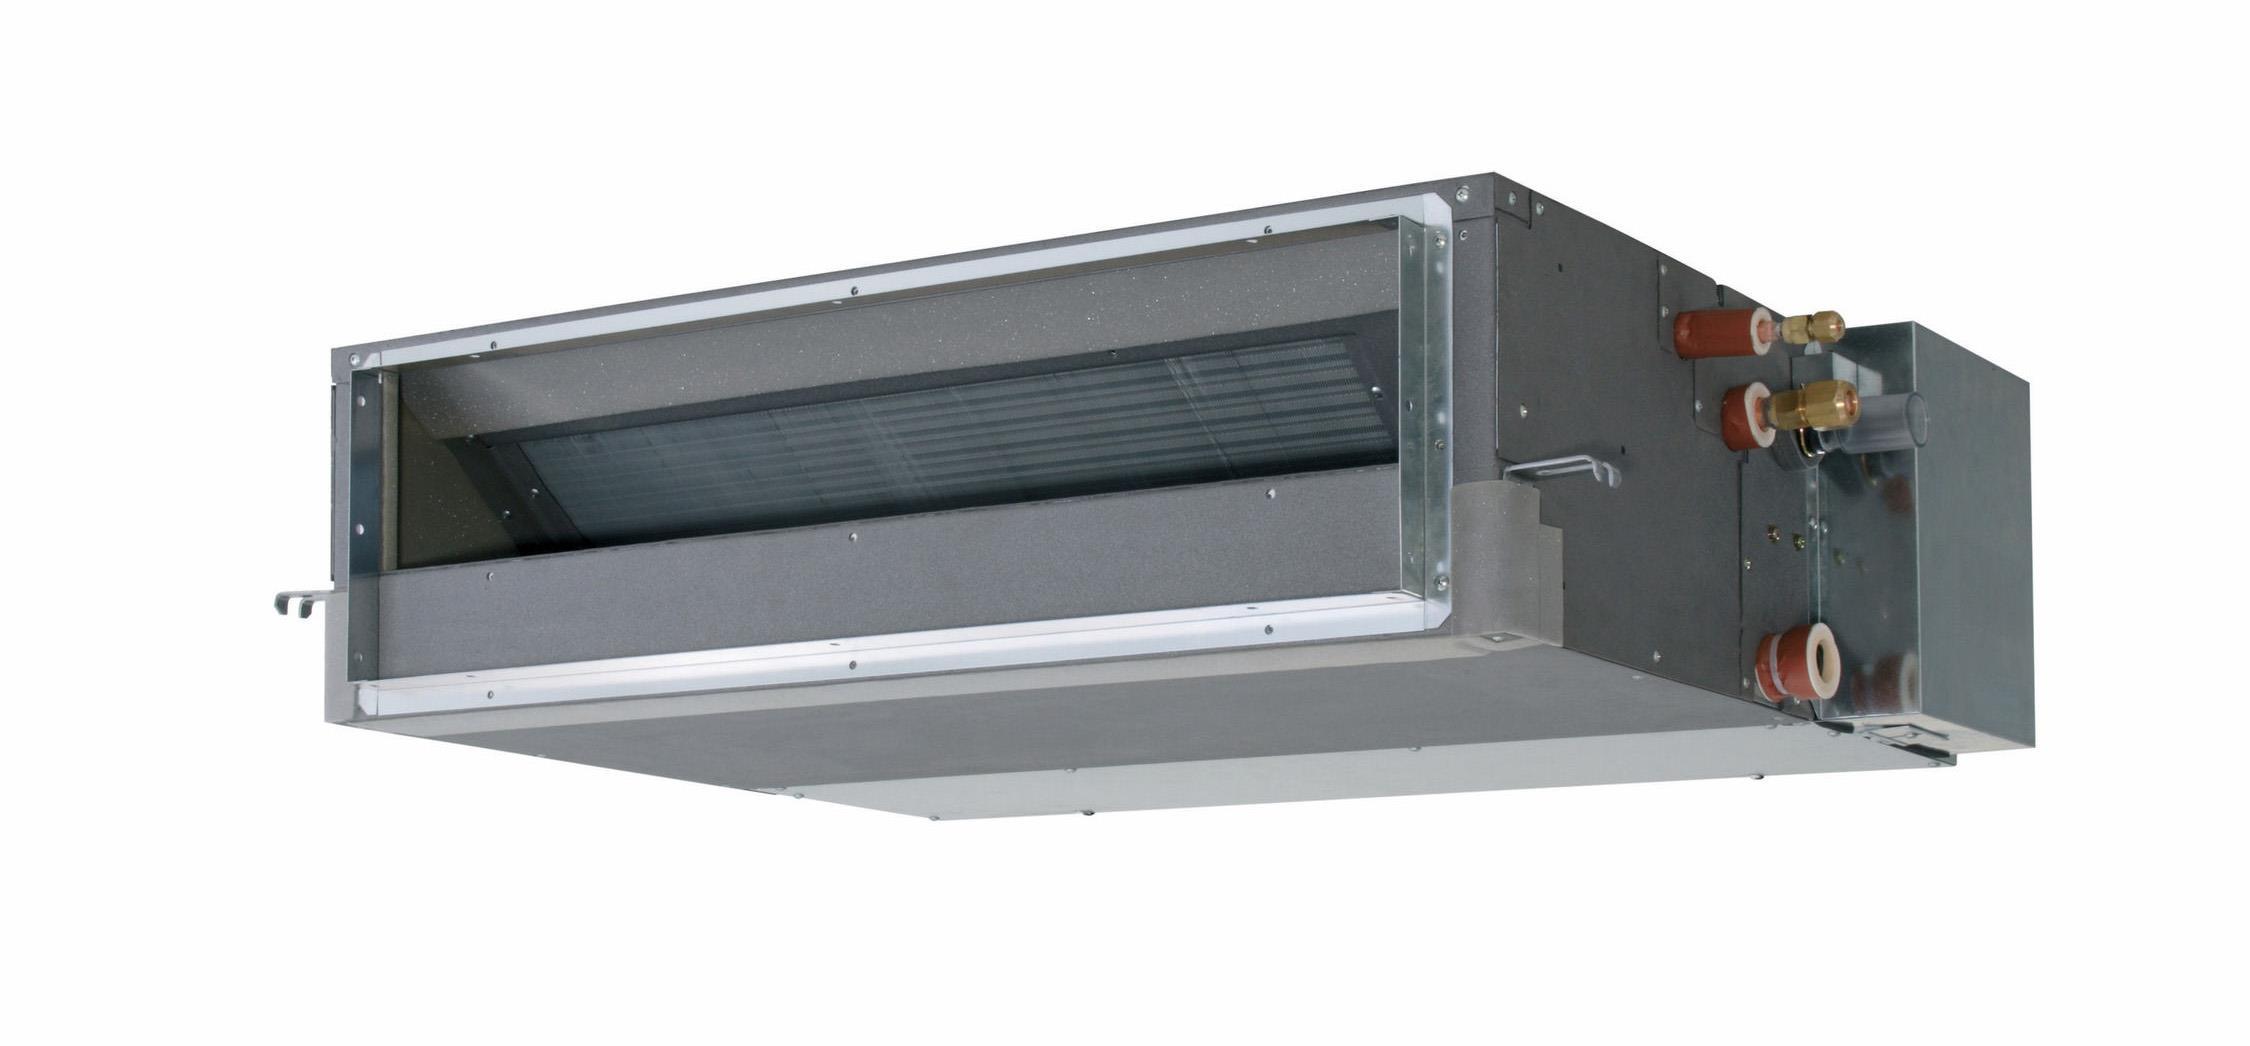 Sell Ac Daikin Split Duct Inverter Type Fbq 71 Dv14